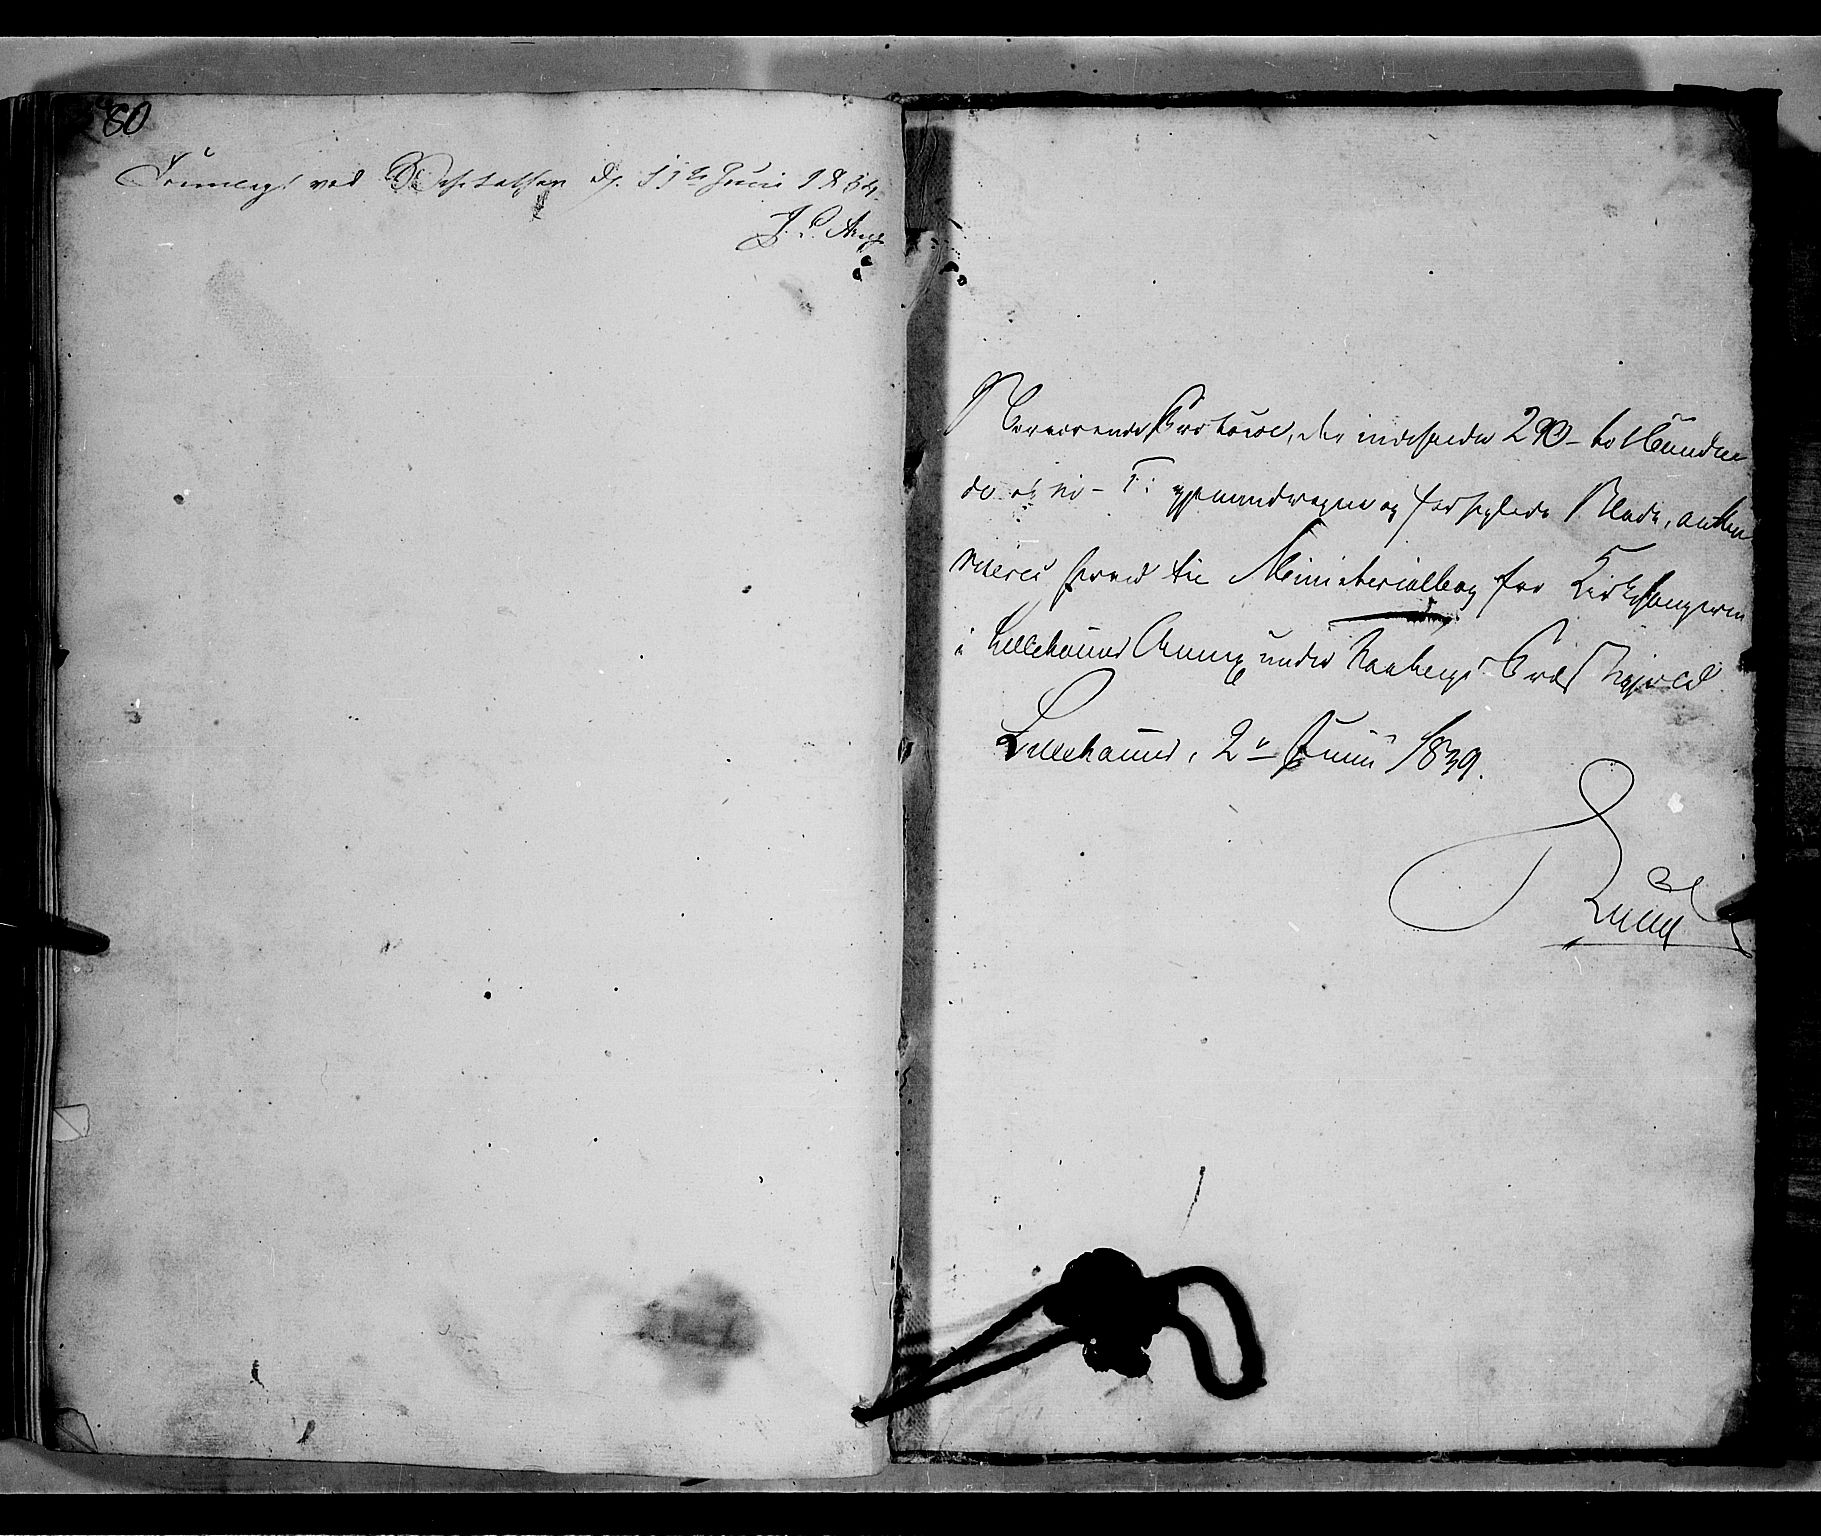 SAH, Fåberg prestekontor, Klokkerbok nr. 6, 1837-1855, s. 580-581